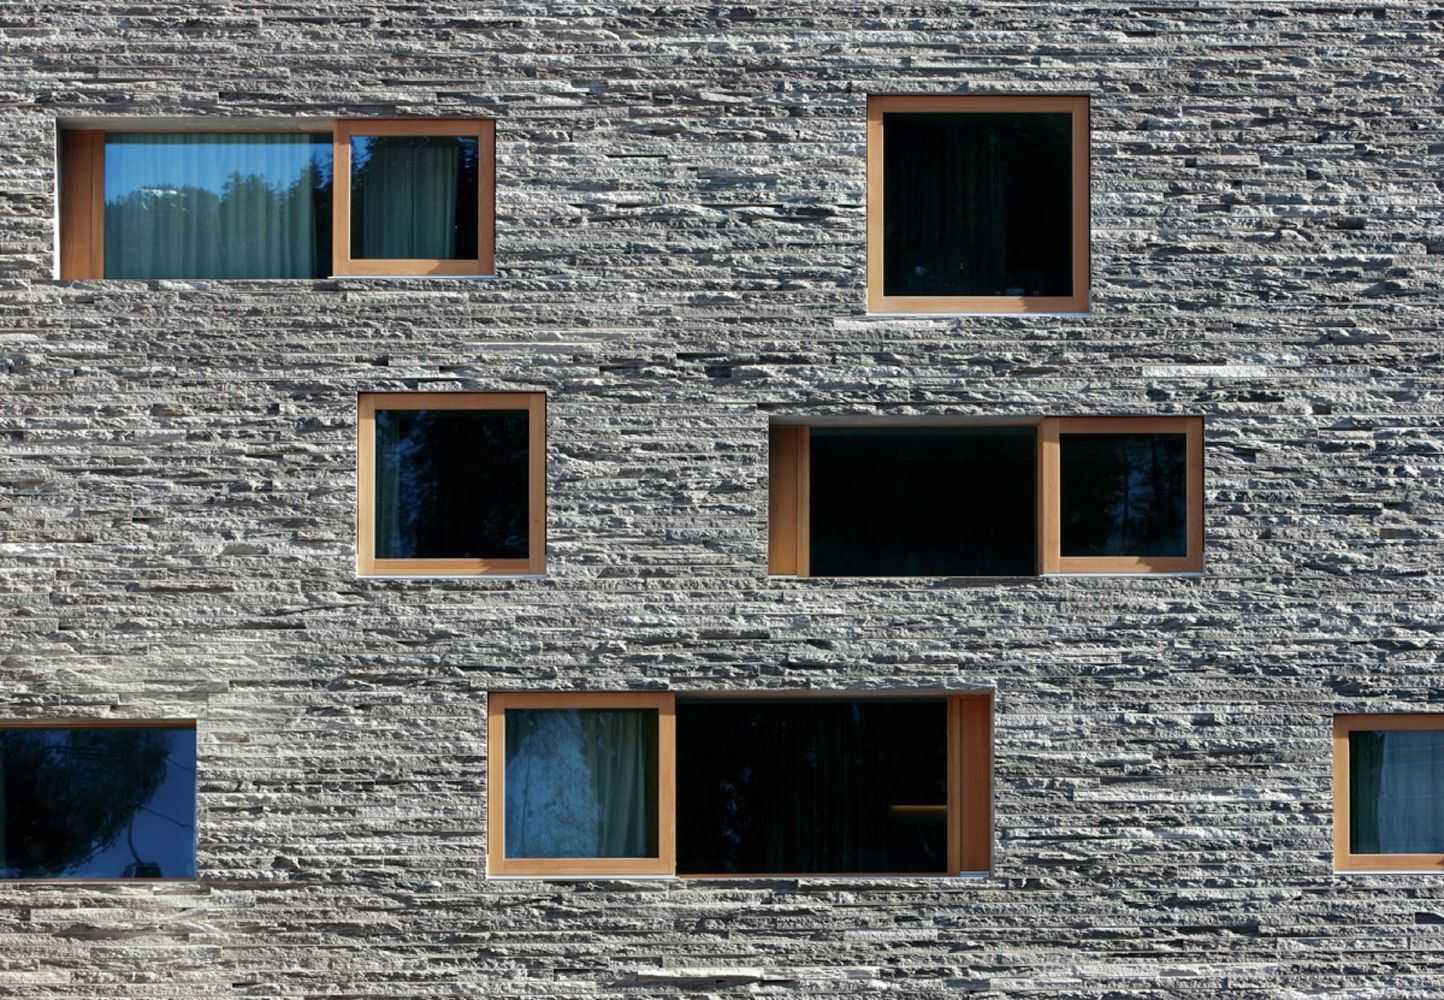 Gallery of Rocksresort / Domenig Architekten - 5